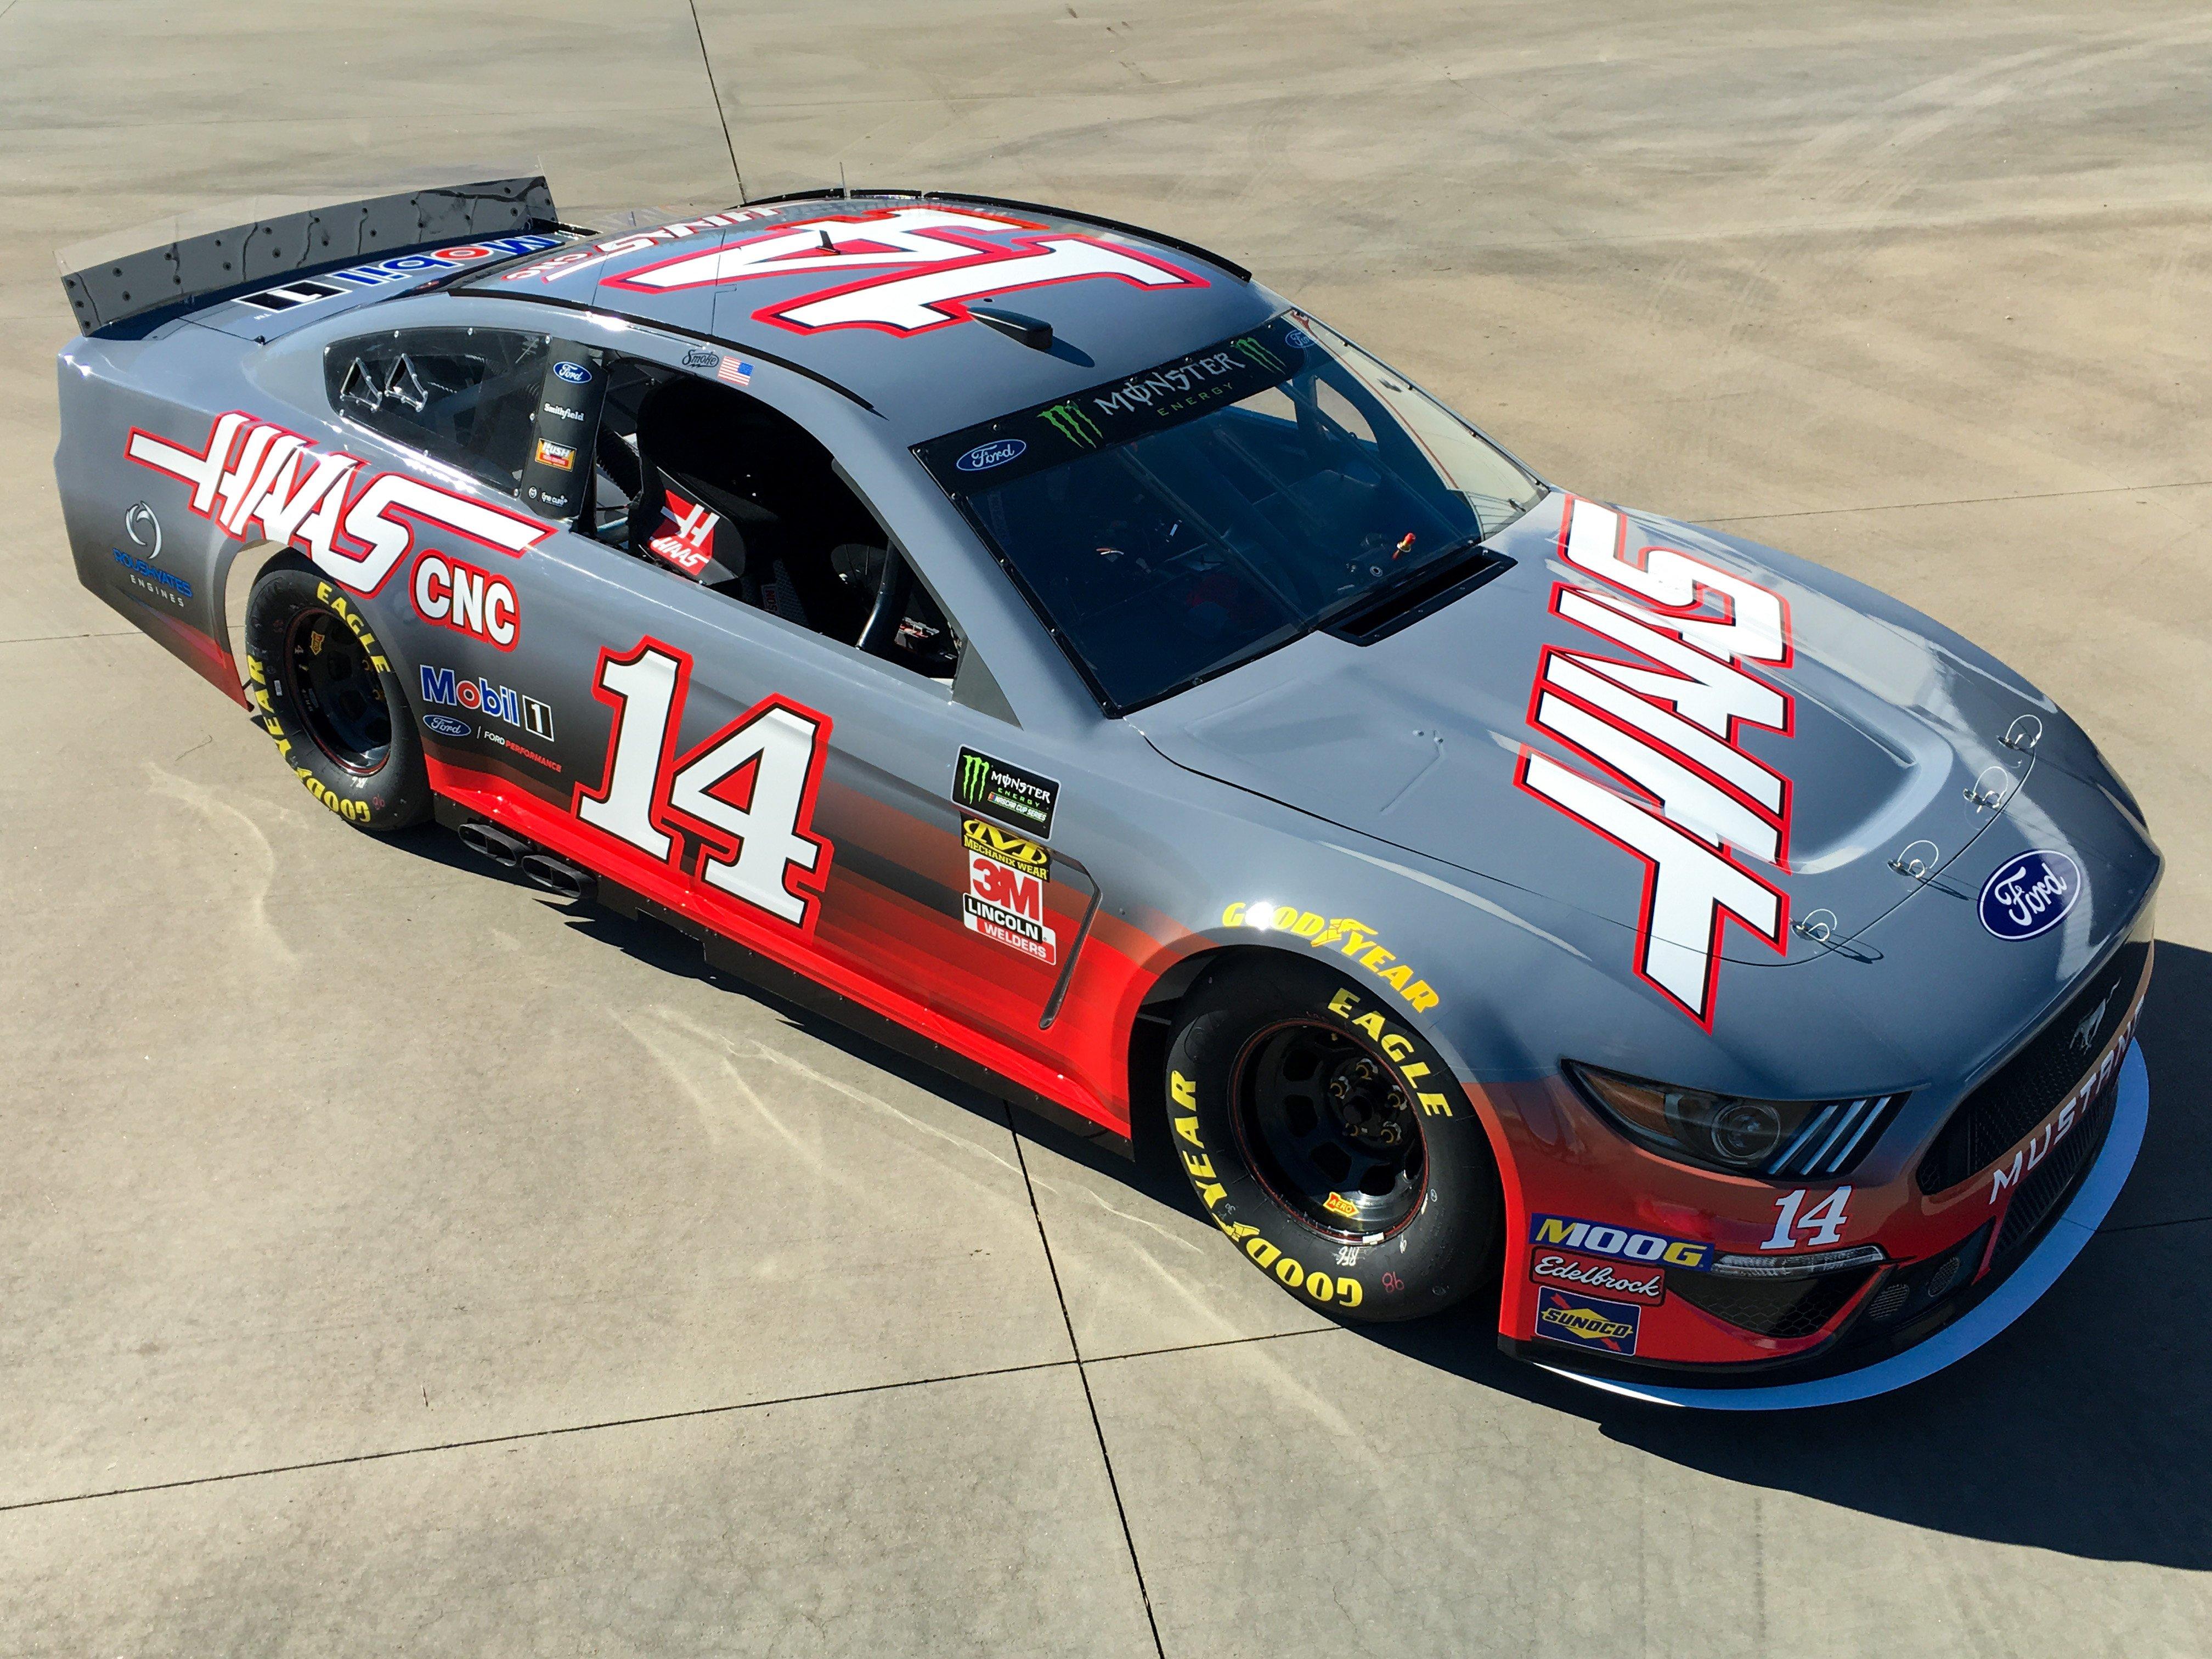 Tony Stewart 14 NASCAR race car for Circuit of the Americas